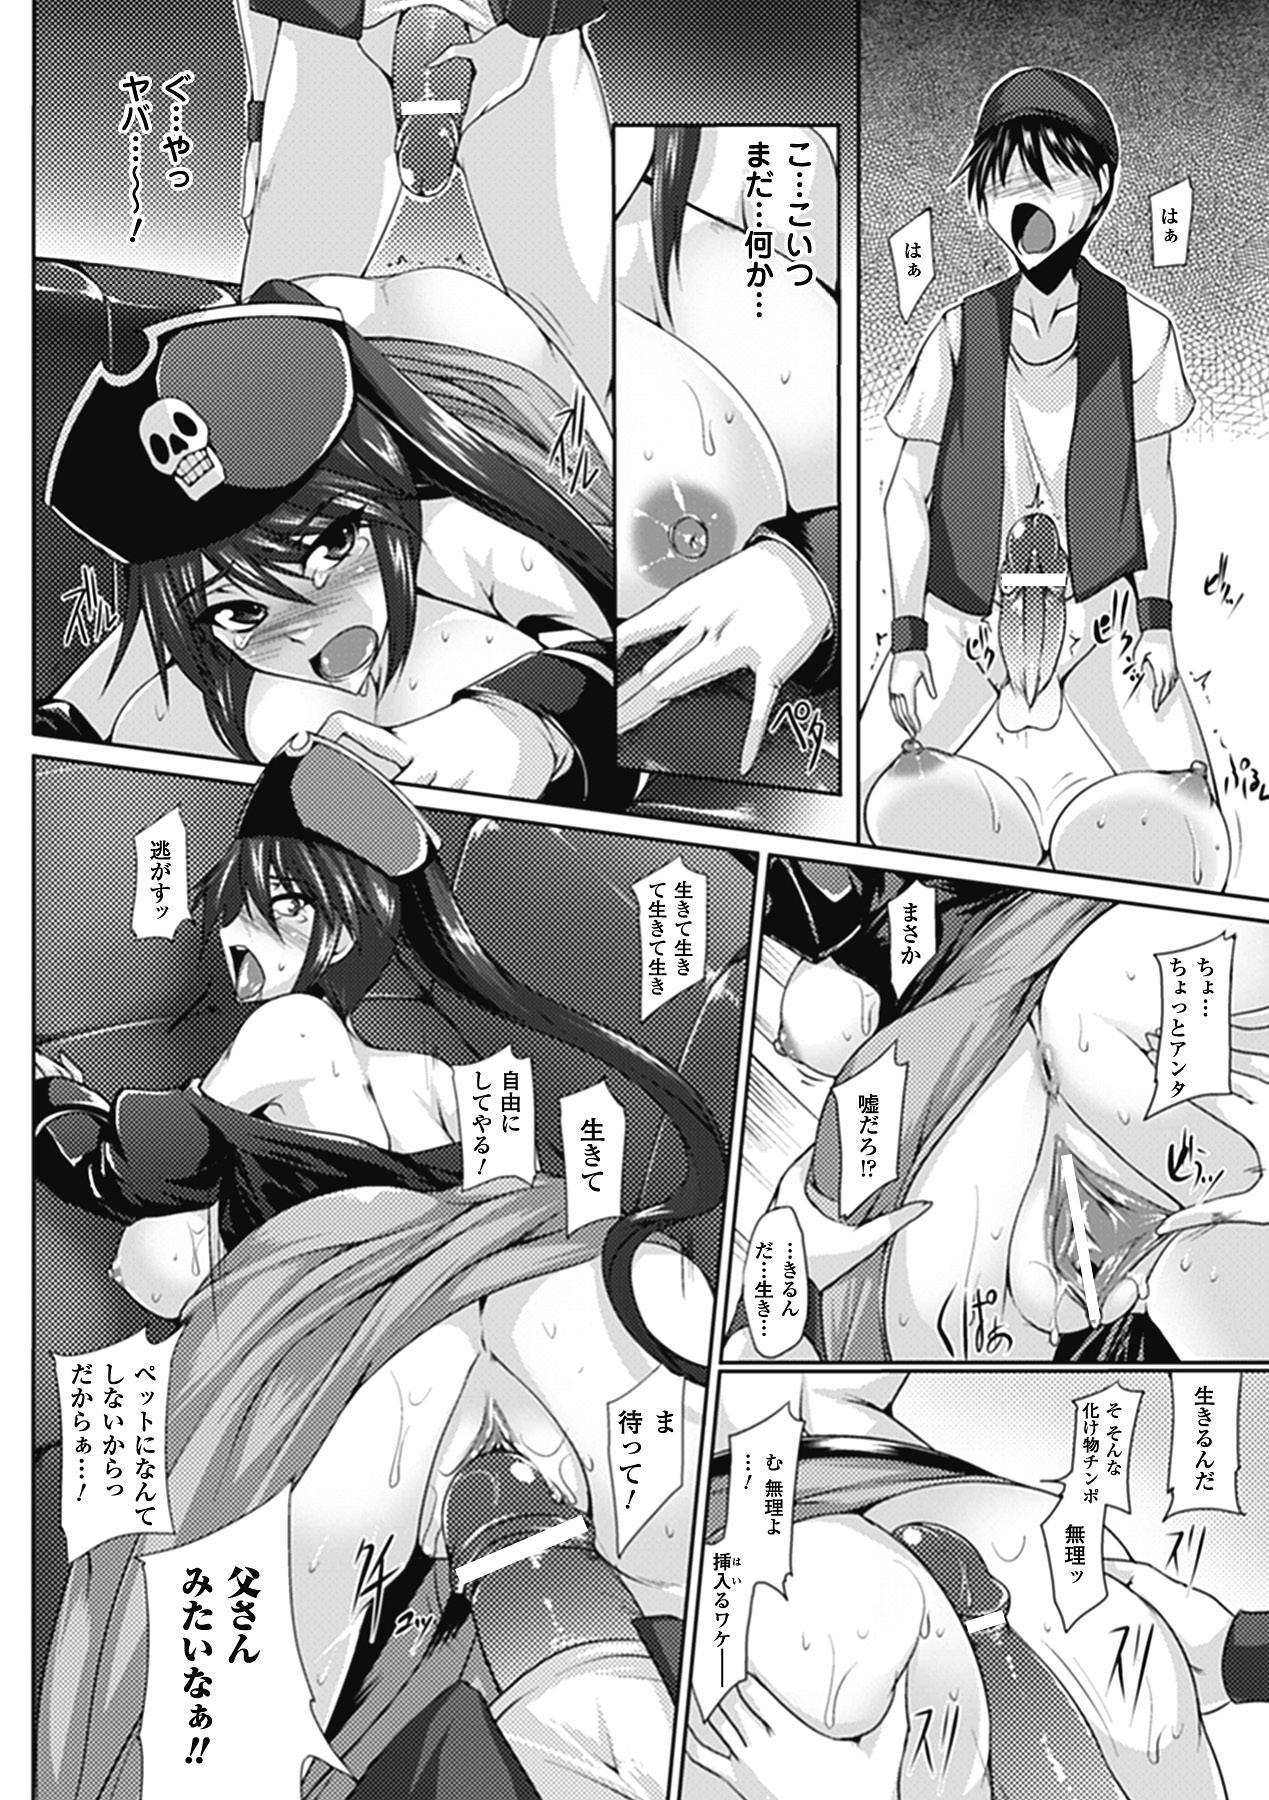 Megami Crisis 1 190